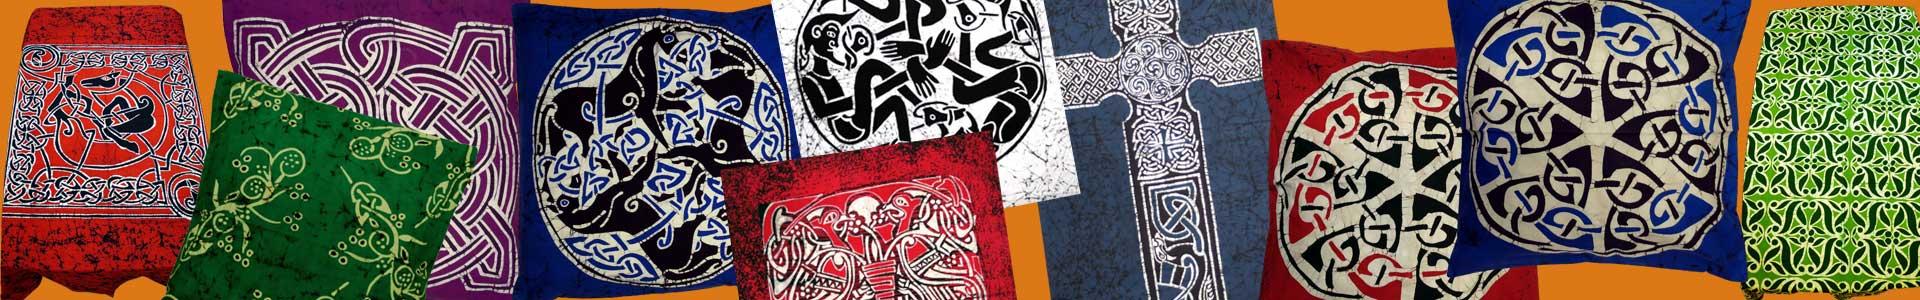 Skye Batiks | Creative Batik and Handloom